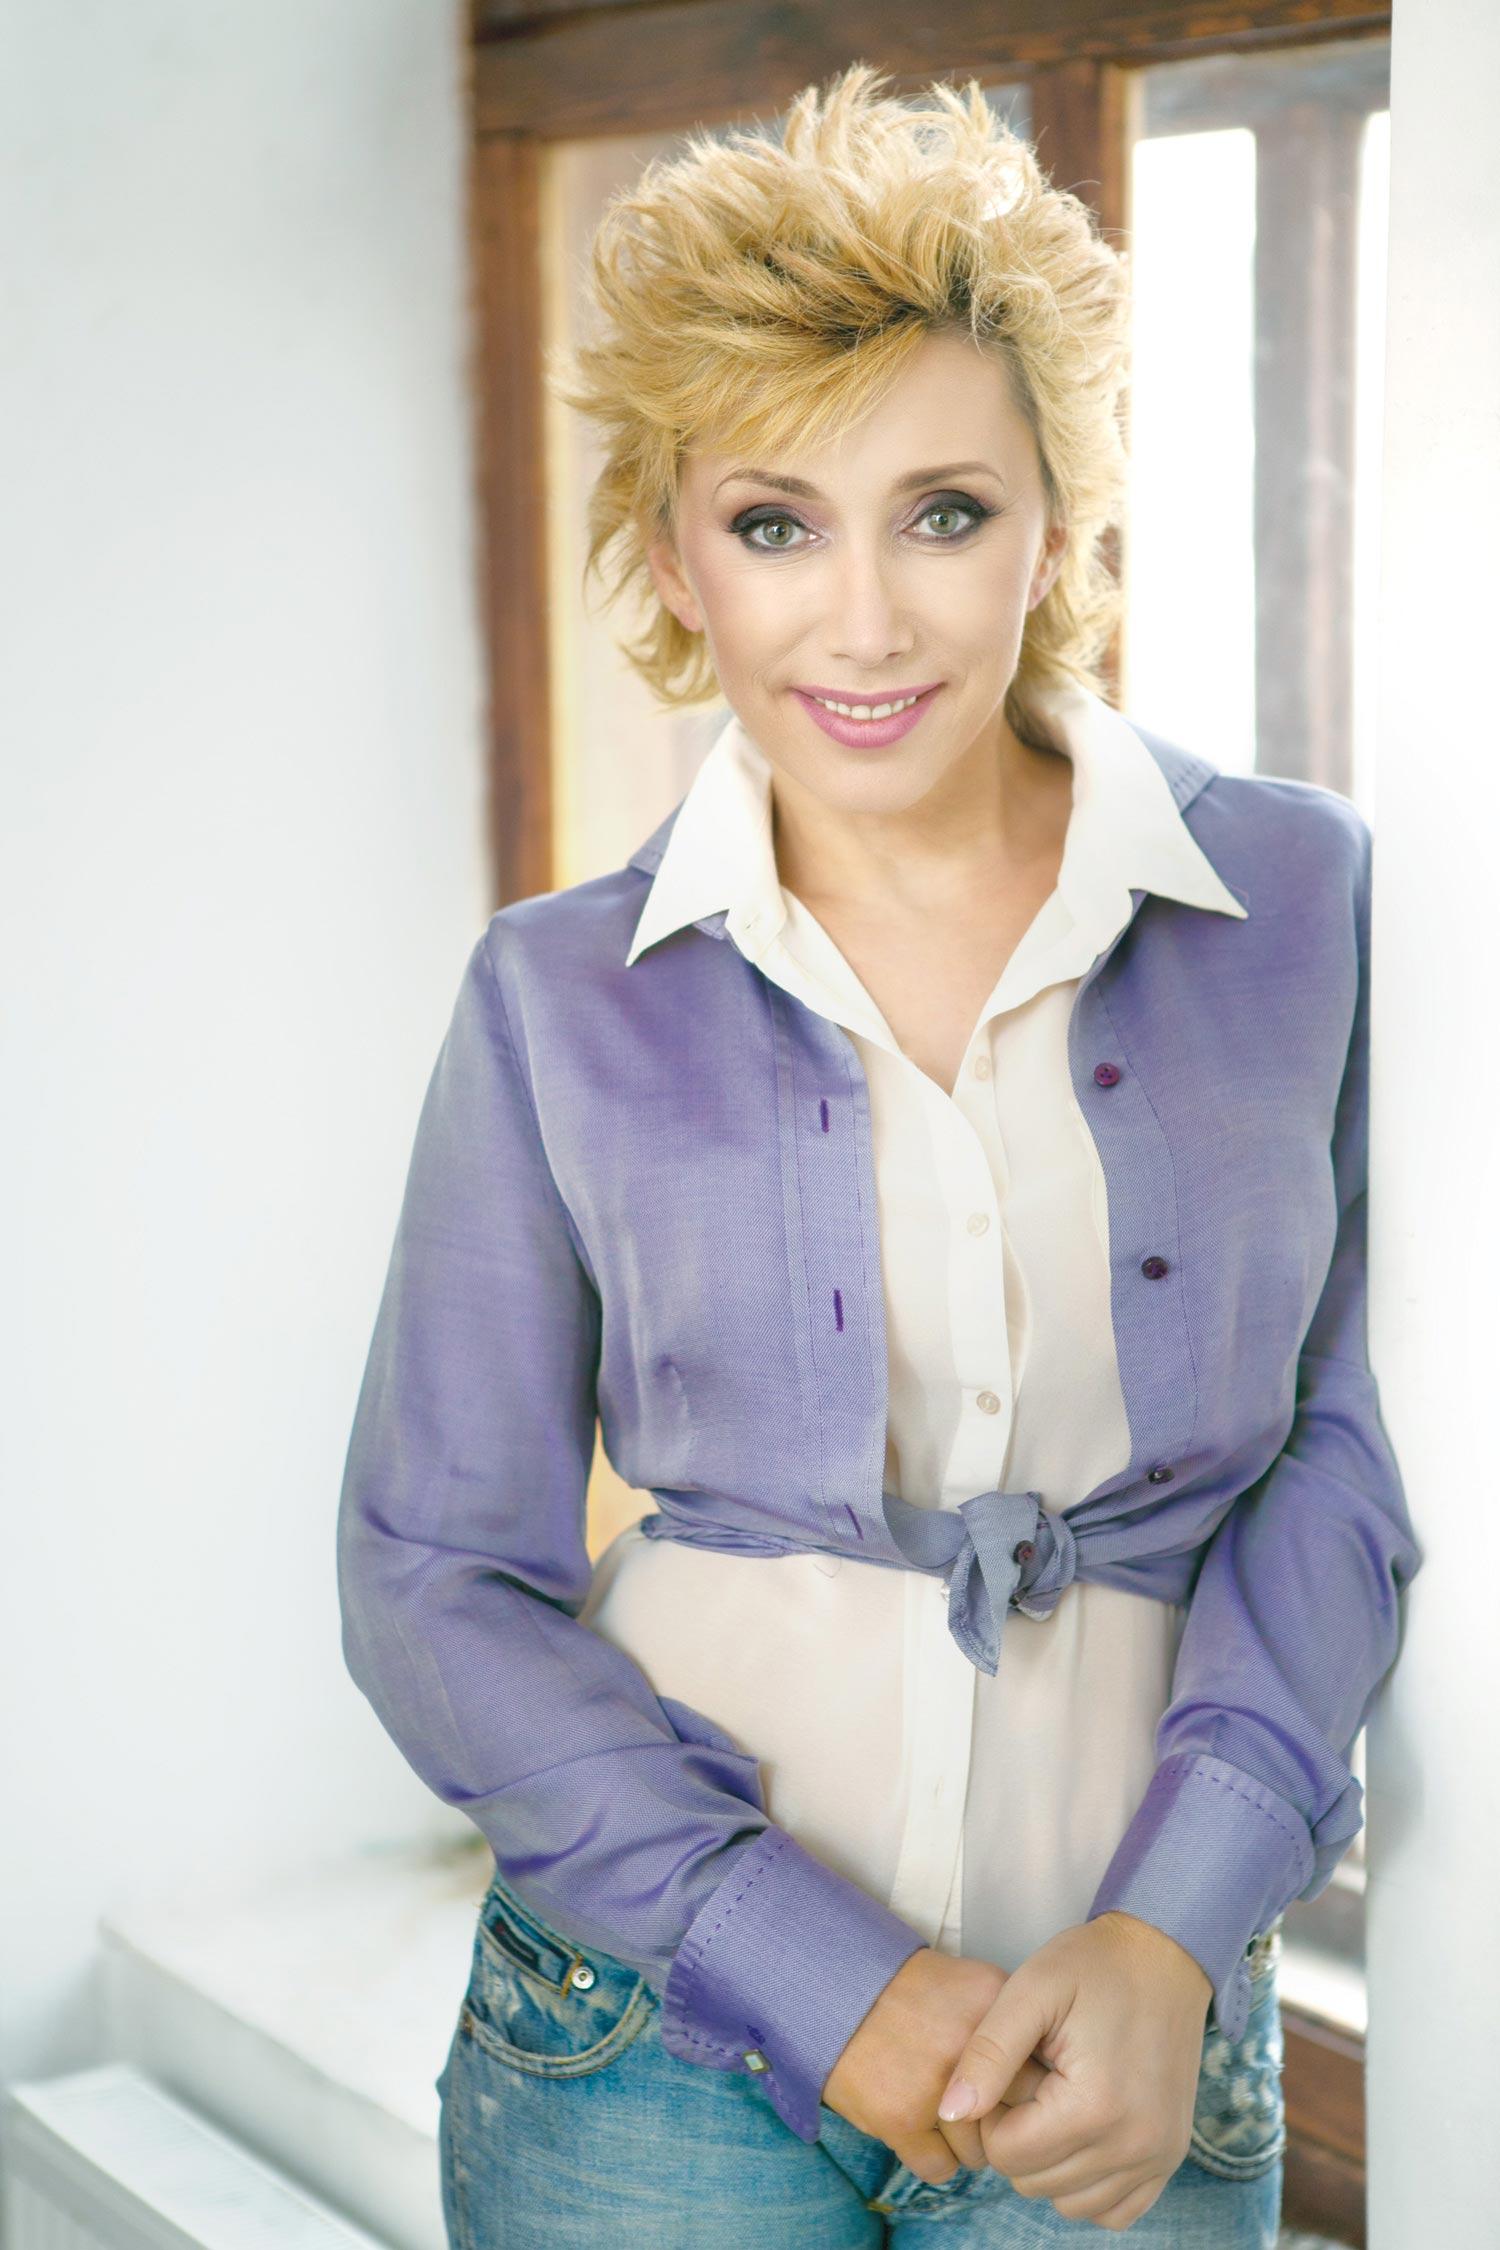 Елена Воробей, актриса, заслуженная артистка России